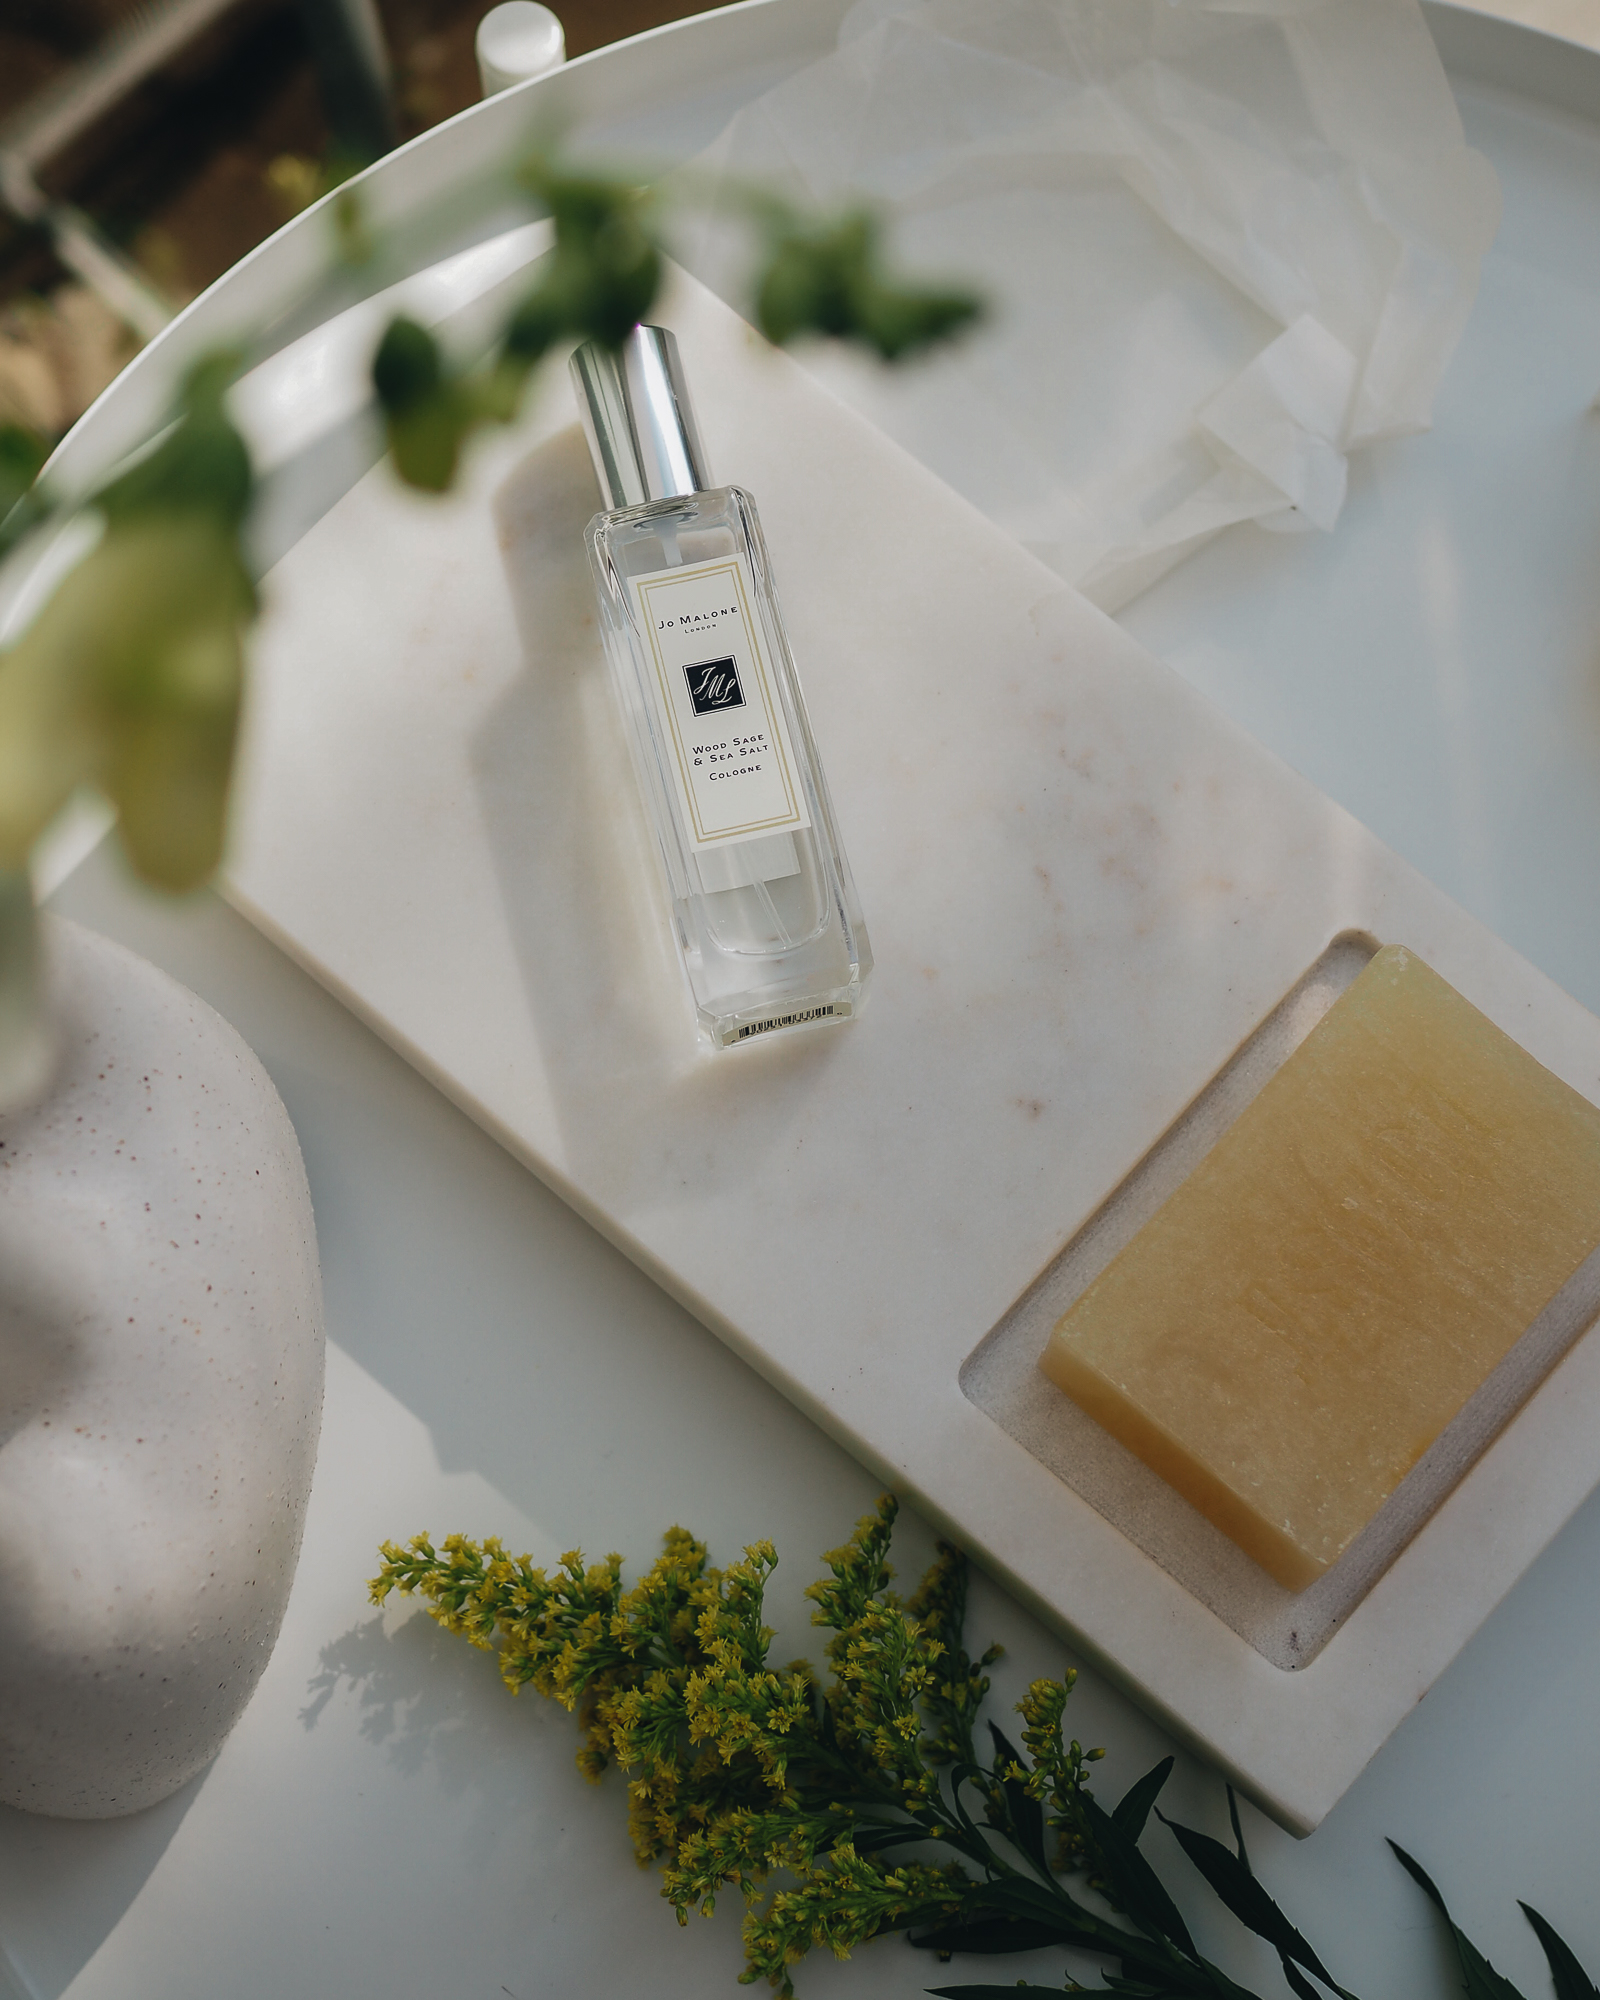 jo malone perfume, toast soap, marble dish